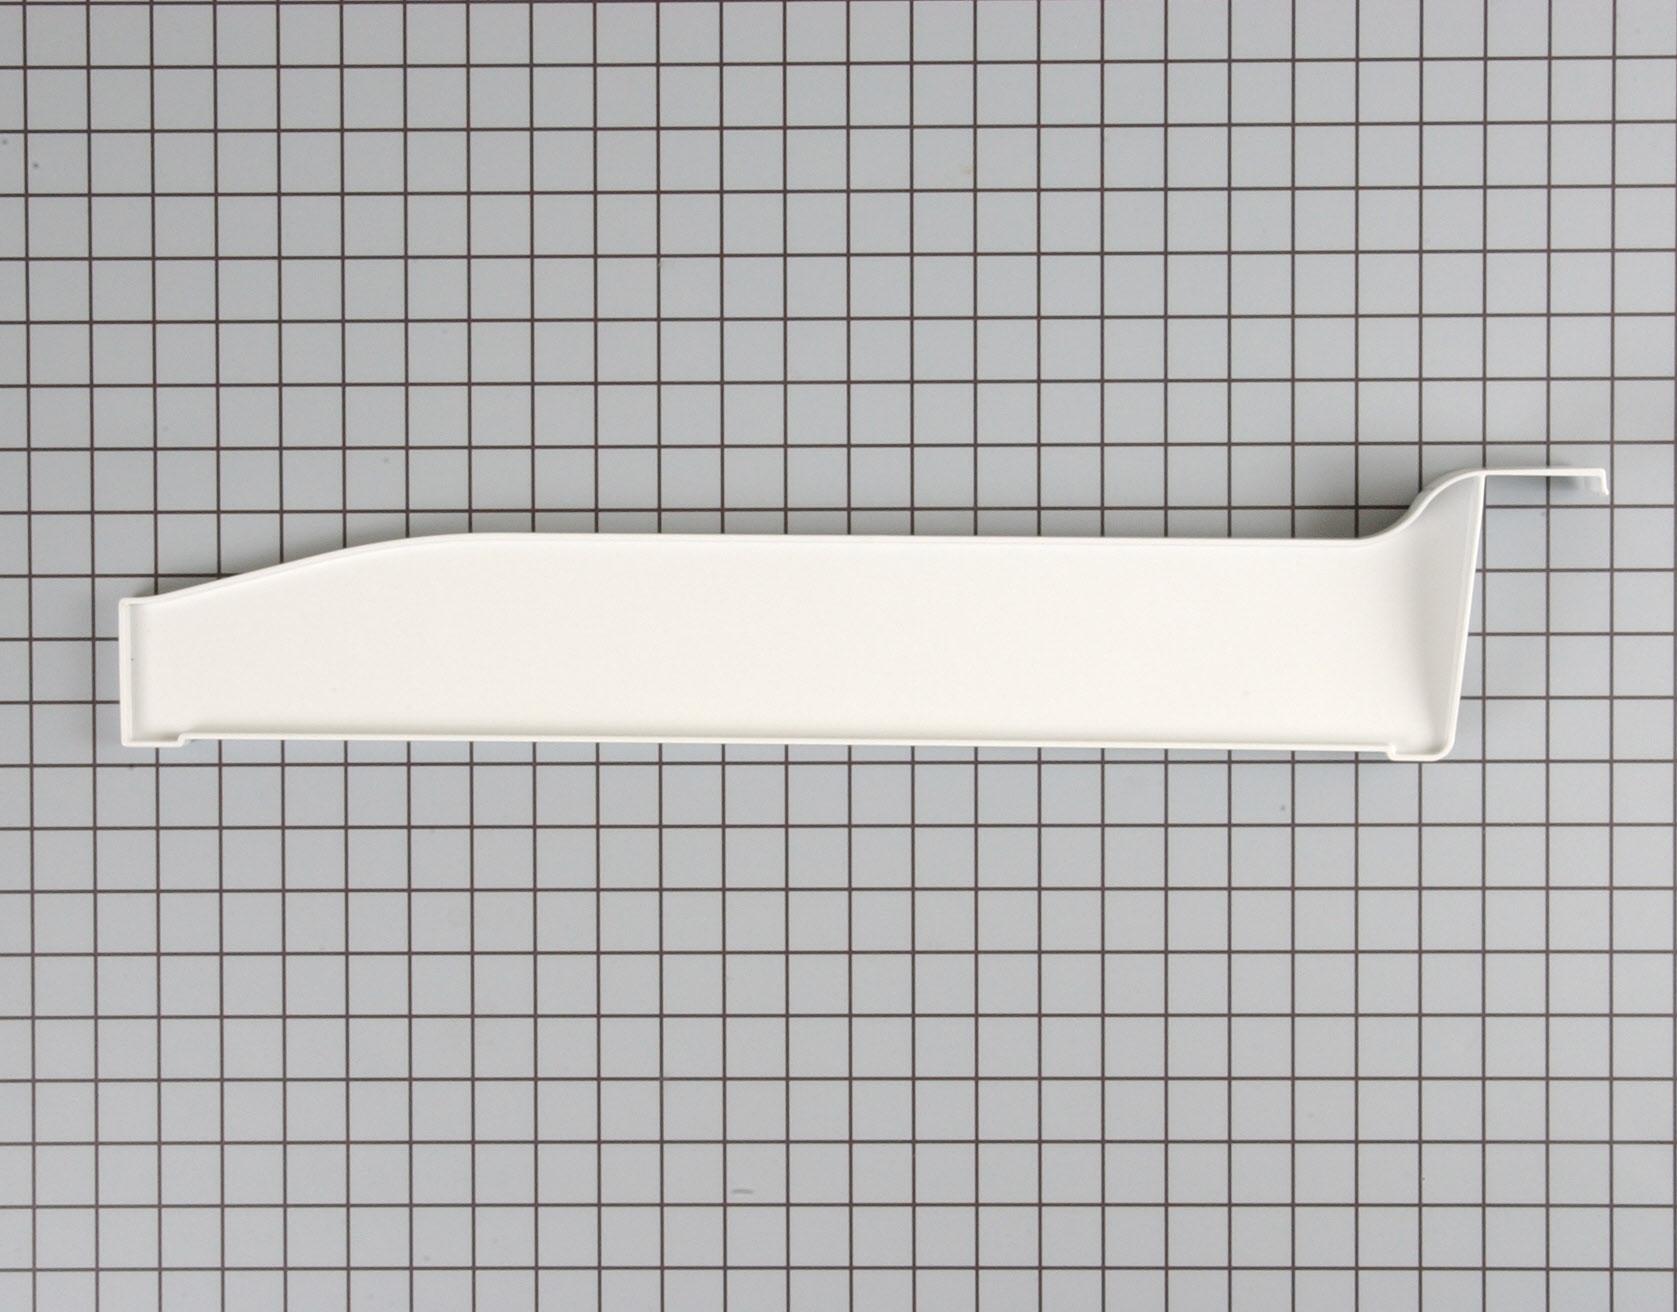 Kenmore Refrigerator Part # WP67002759 - Drawer Divider